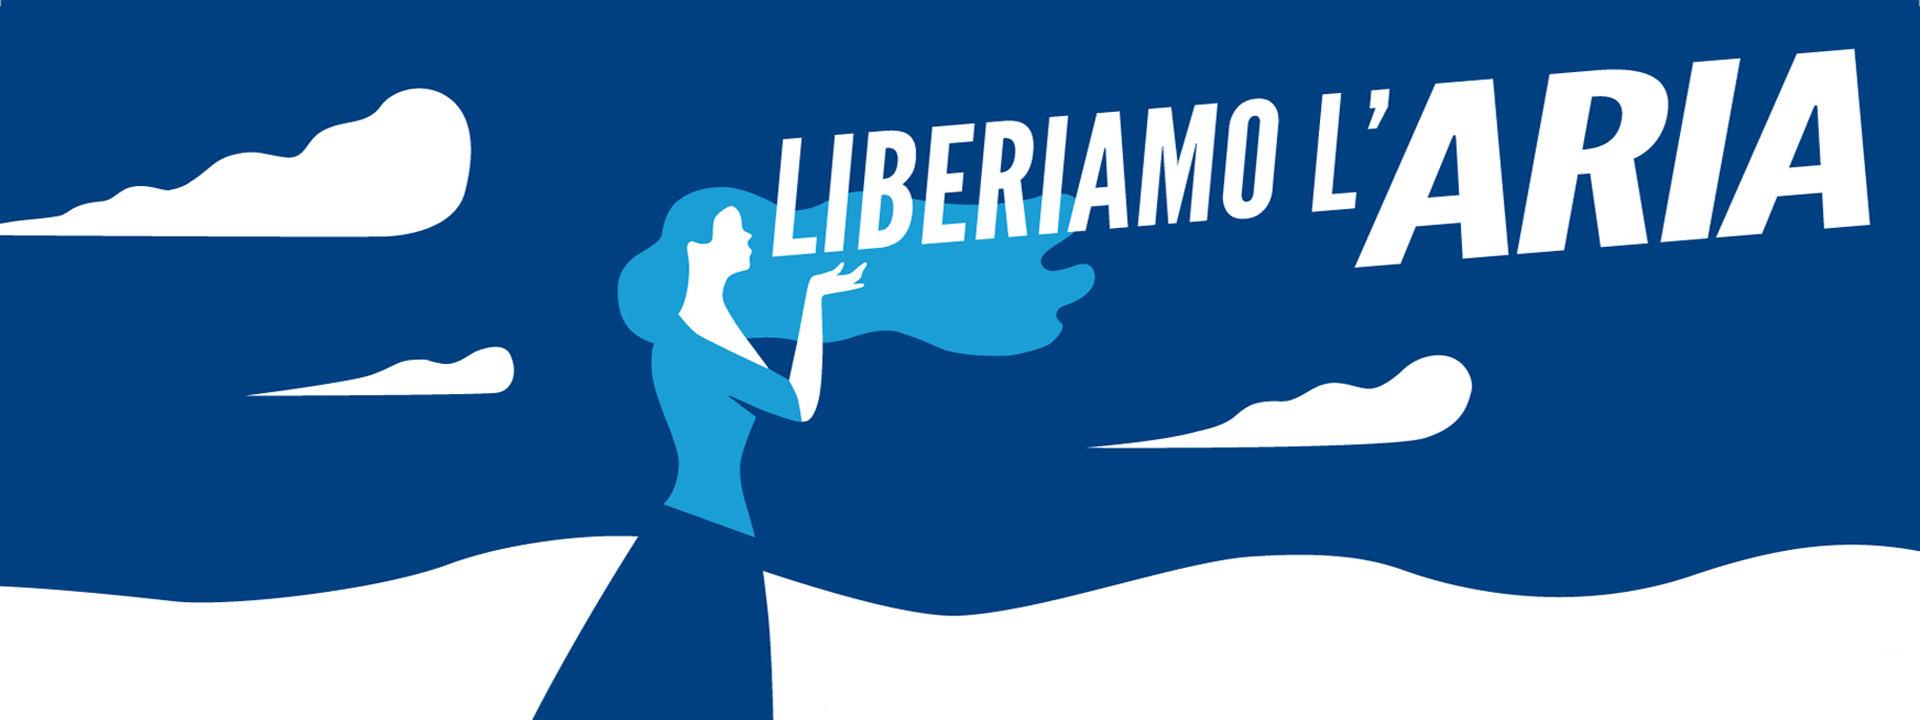 Banner campagna di comunicazione